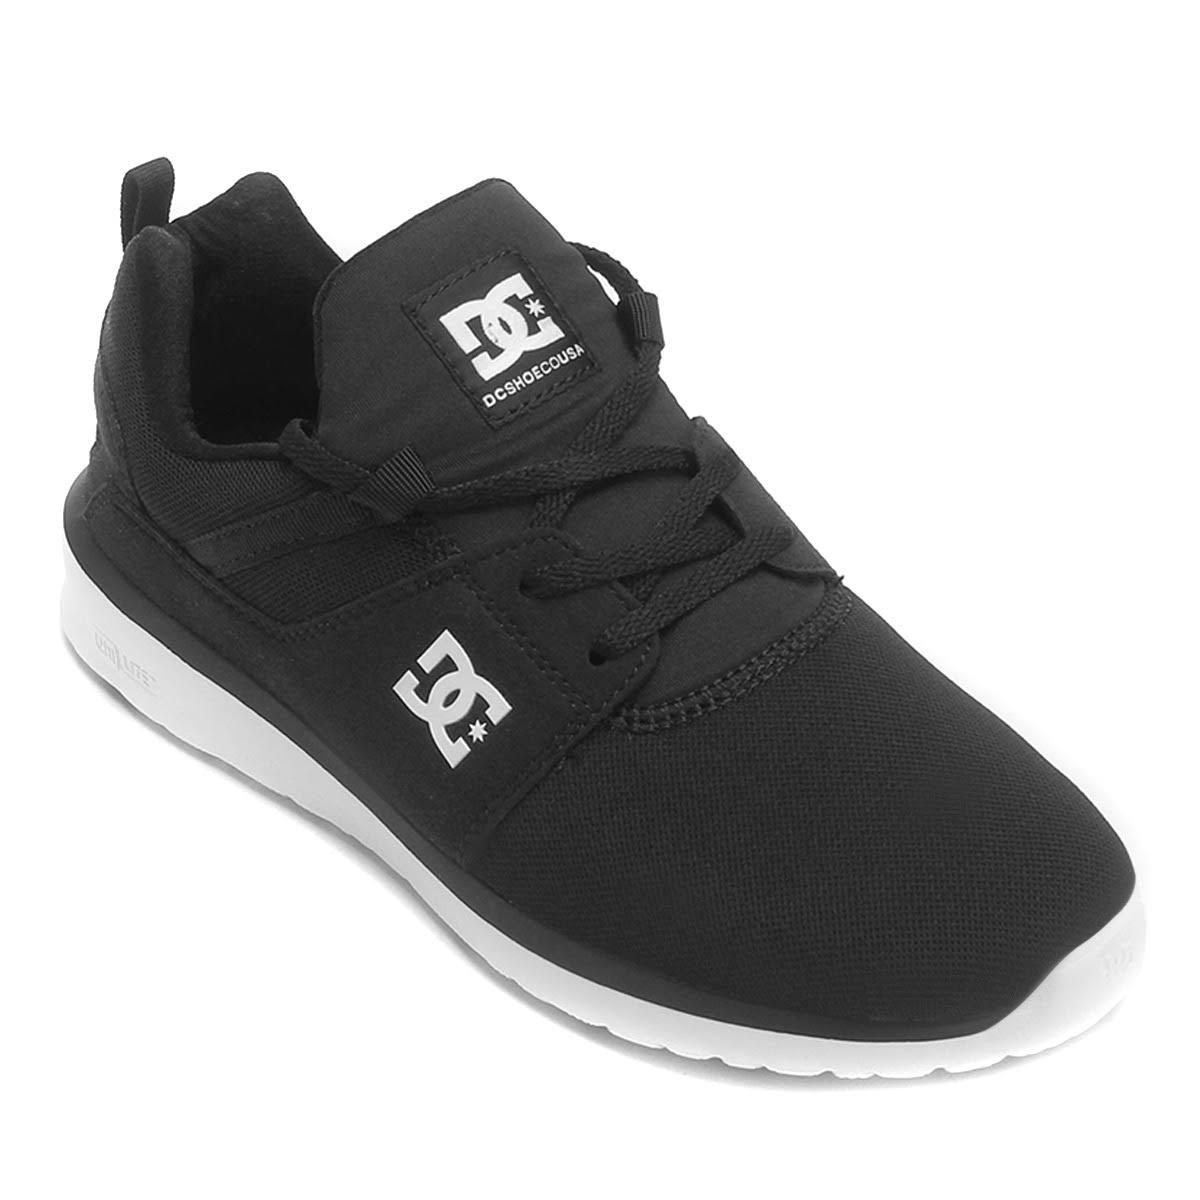 Dc Shoes Scarpe Uomo bianco Heathrow Nero qVSGUMzp